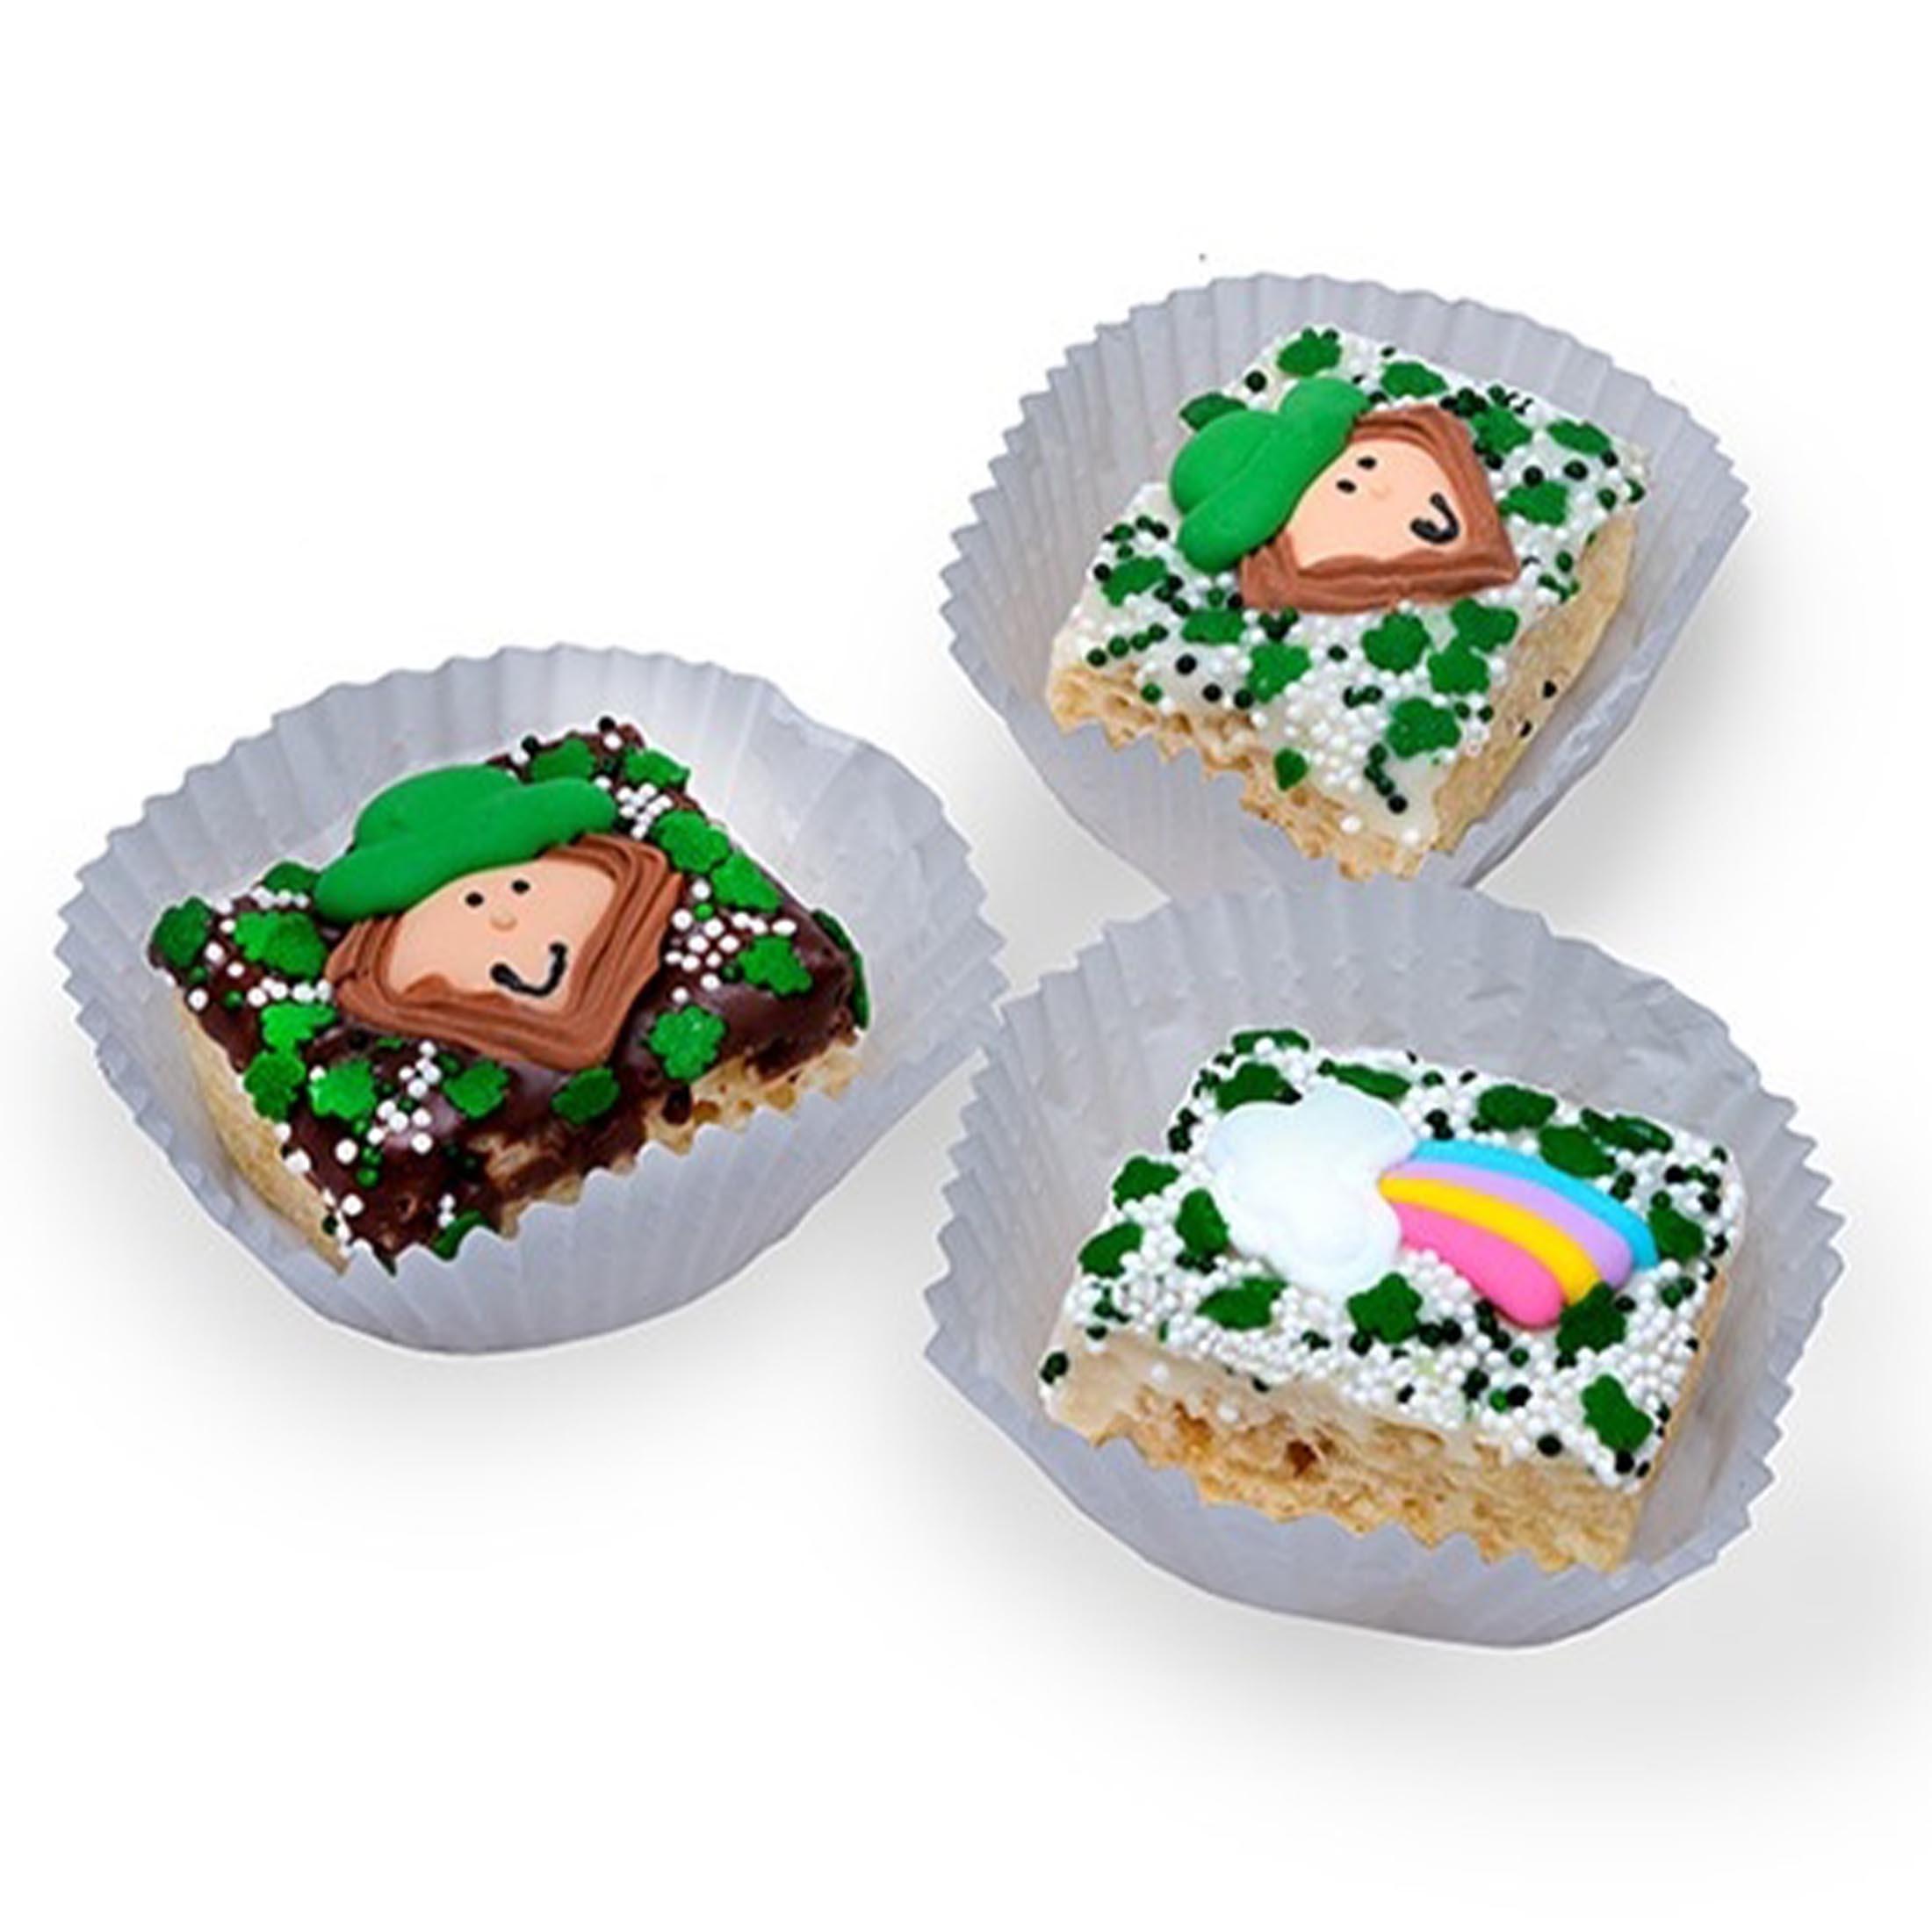 St. Patrick's Chocolate Dipped Mini Crispy Rice Bars